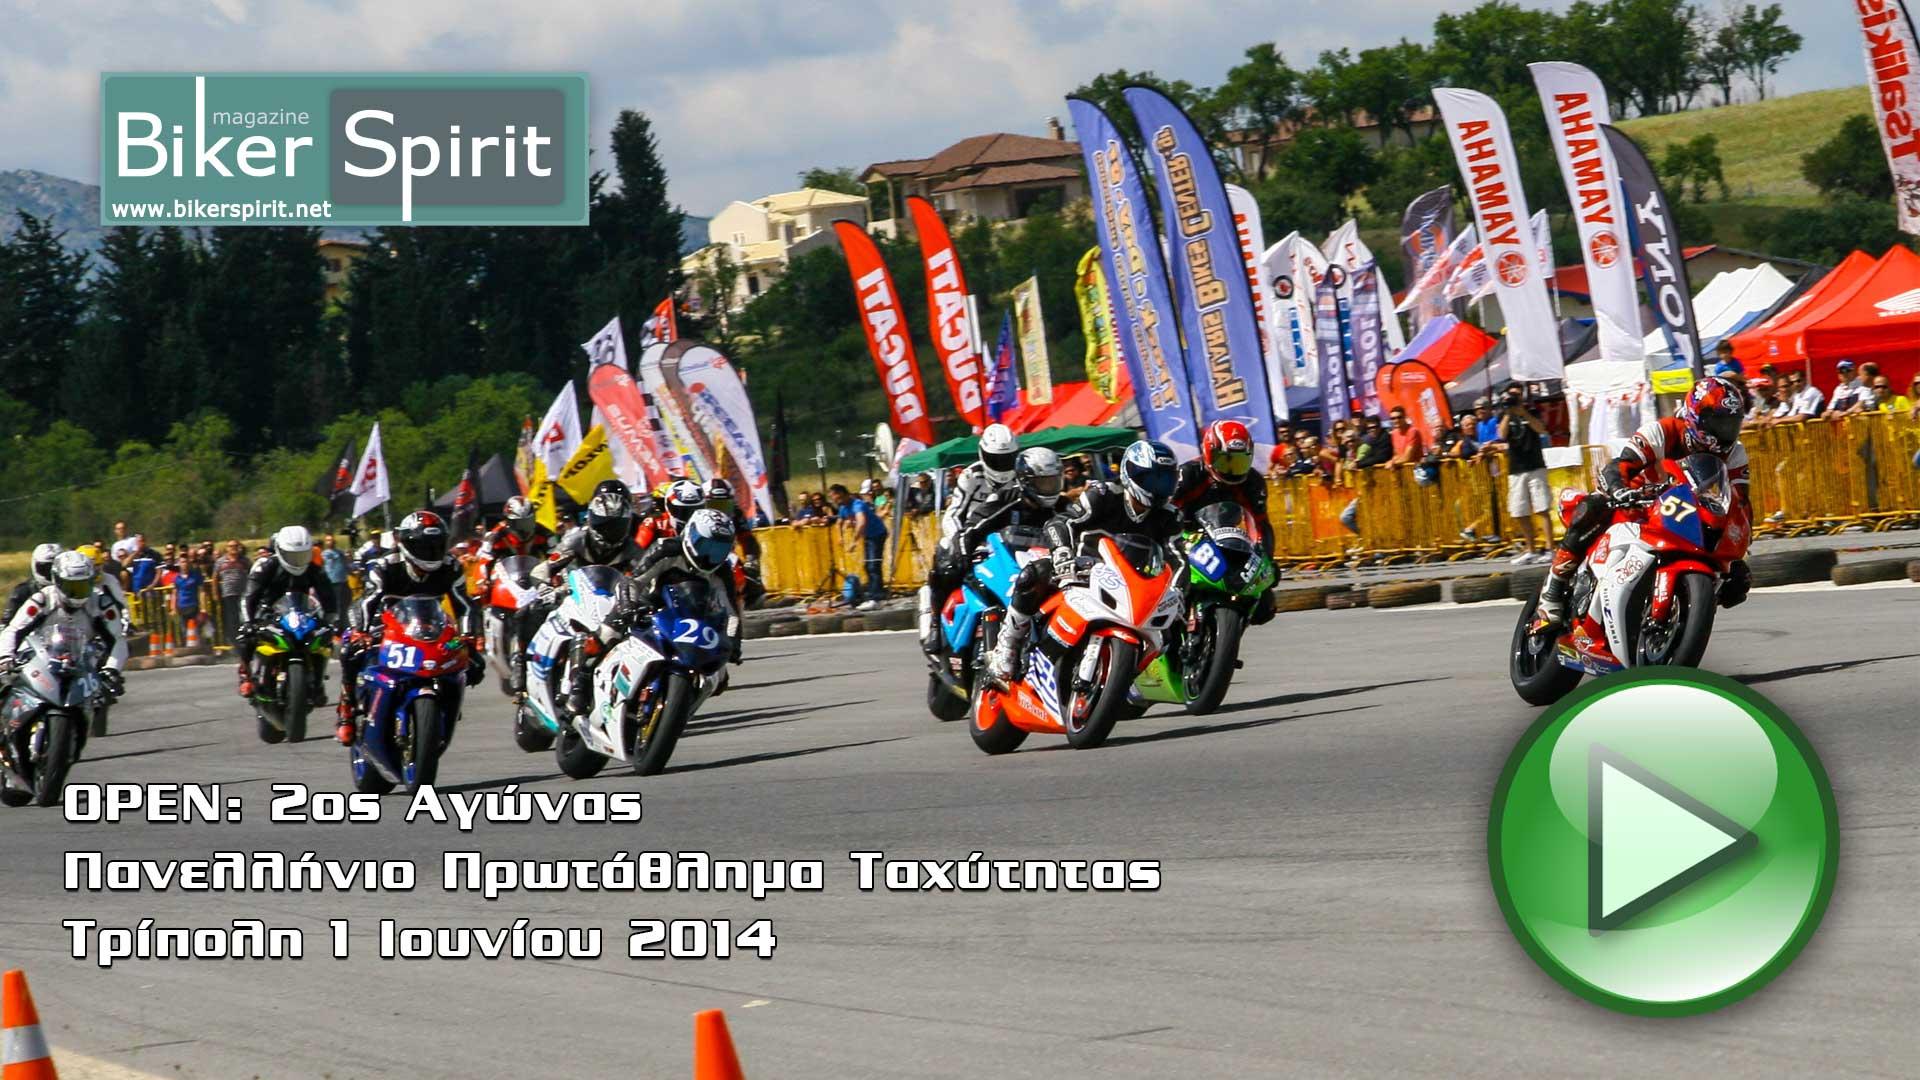 a691e234693 Biker Spirit magazine Περιοδικό Μοτοσυκλέτας Page 437